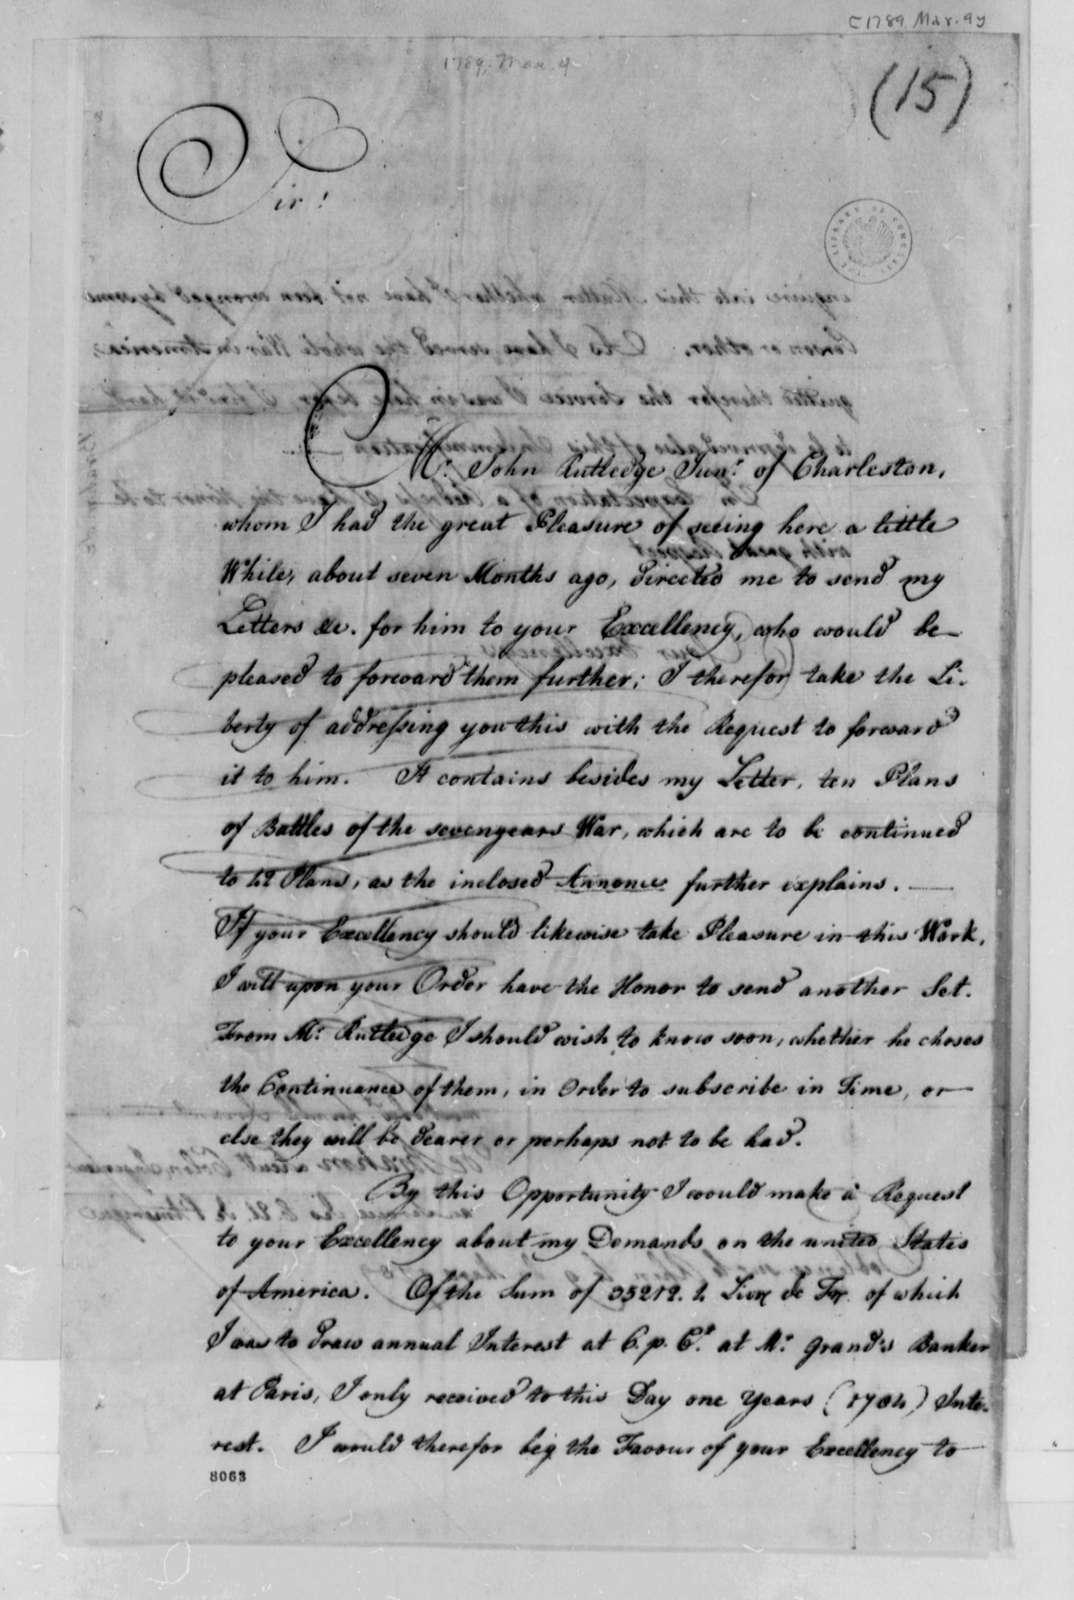 De Brahm to Thomas Jefferson, March 9, 1789